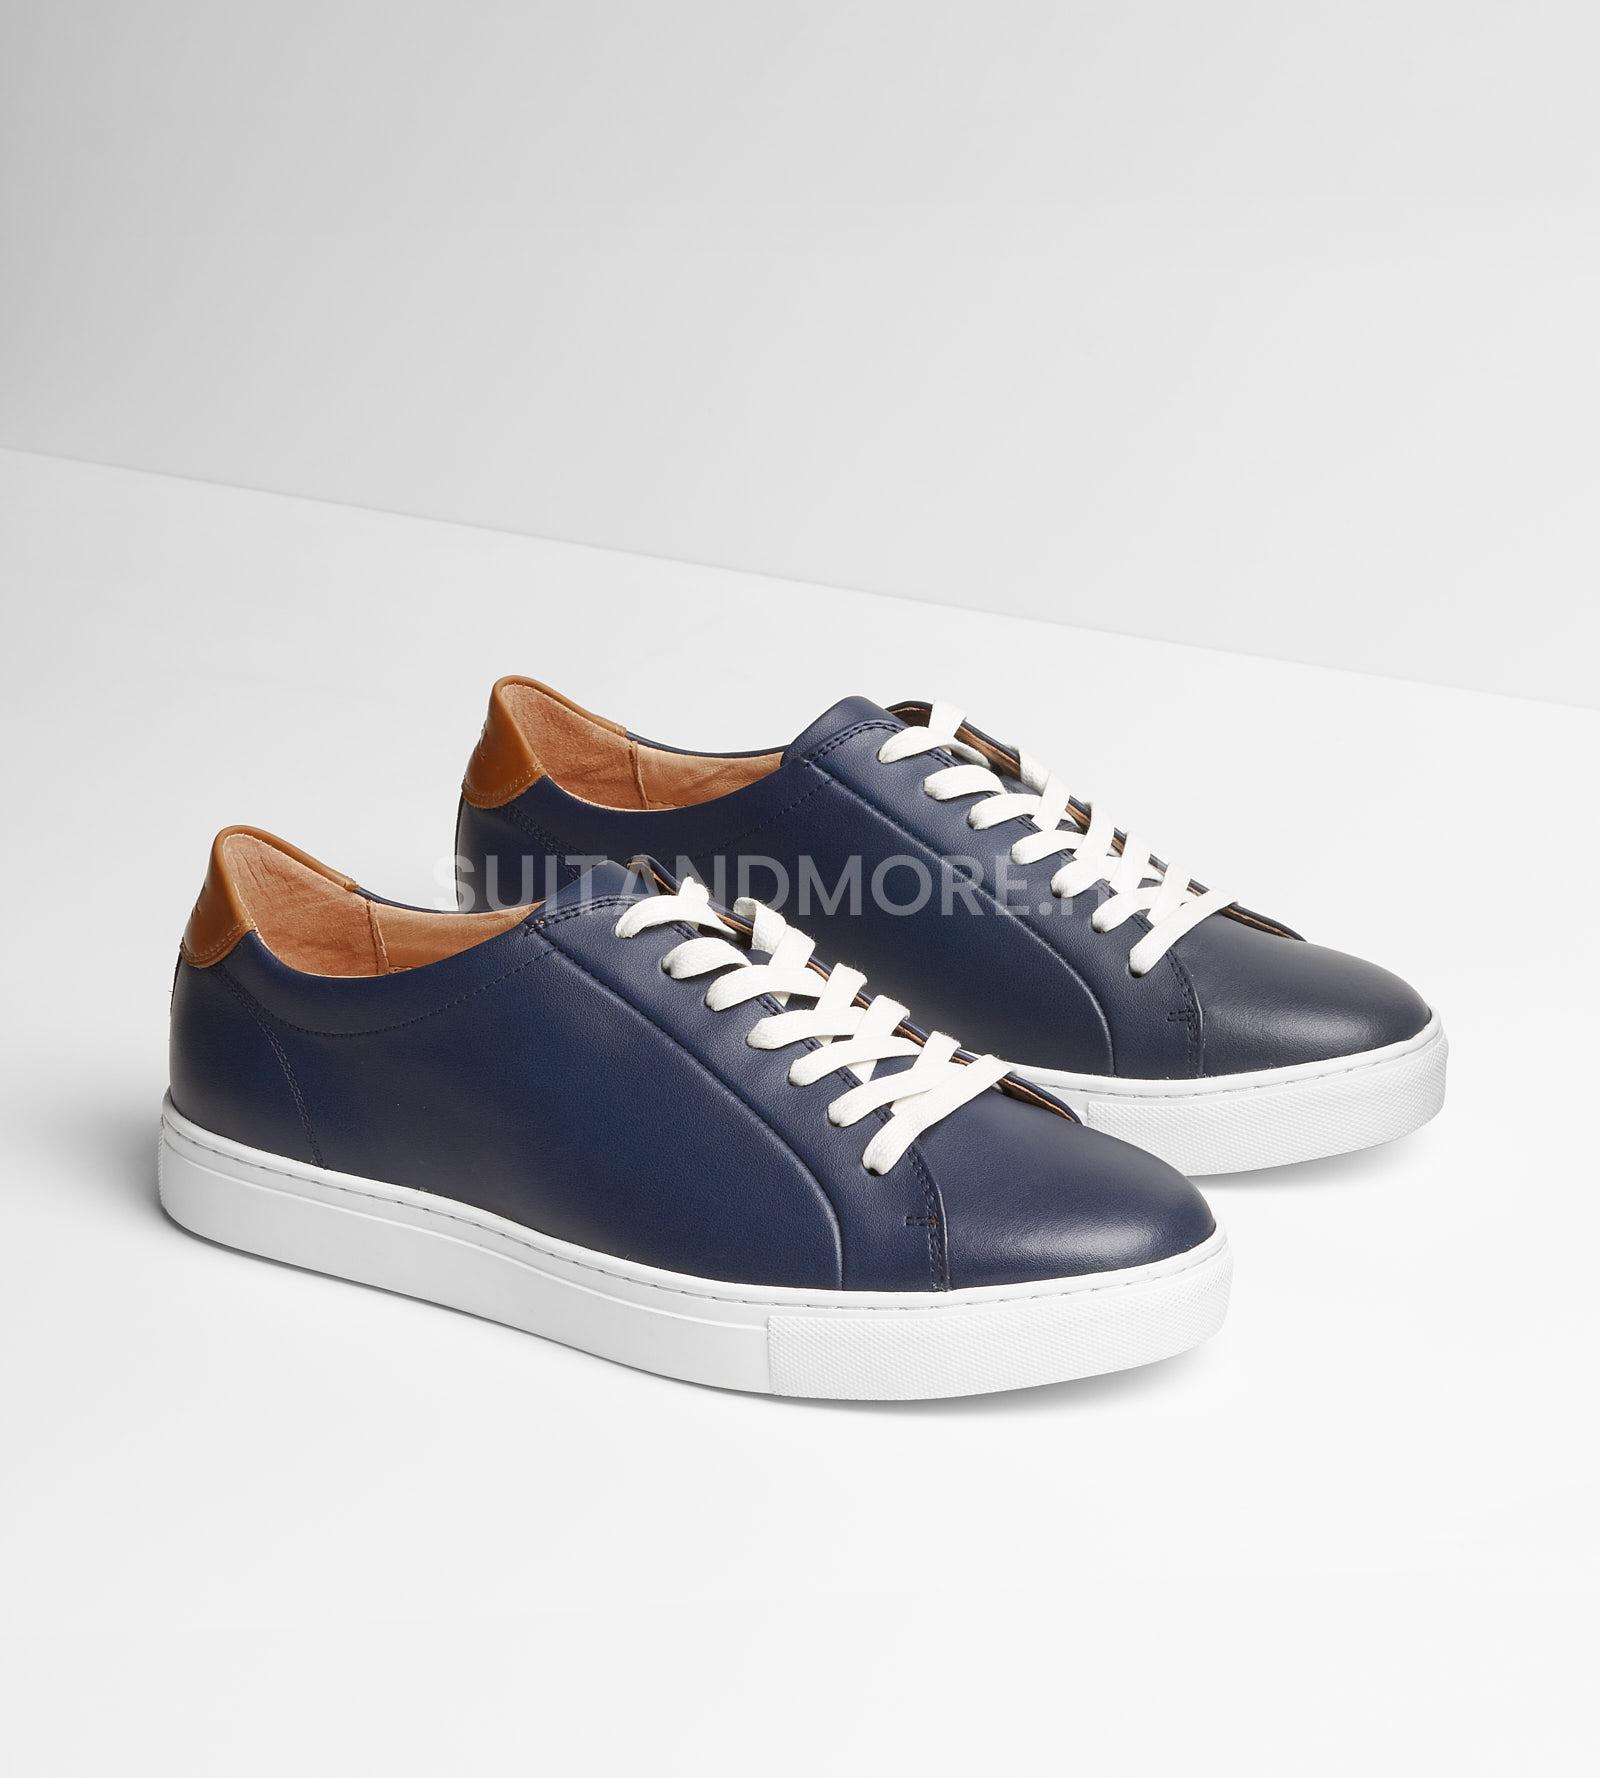 digel-kek-sneaker-cipo-seth-1189704-20-01